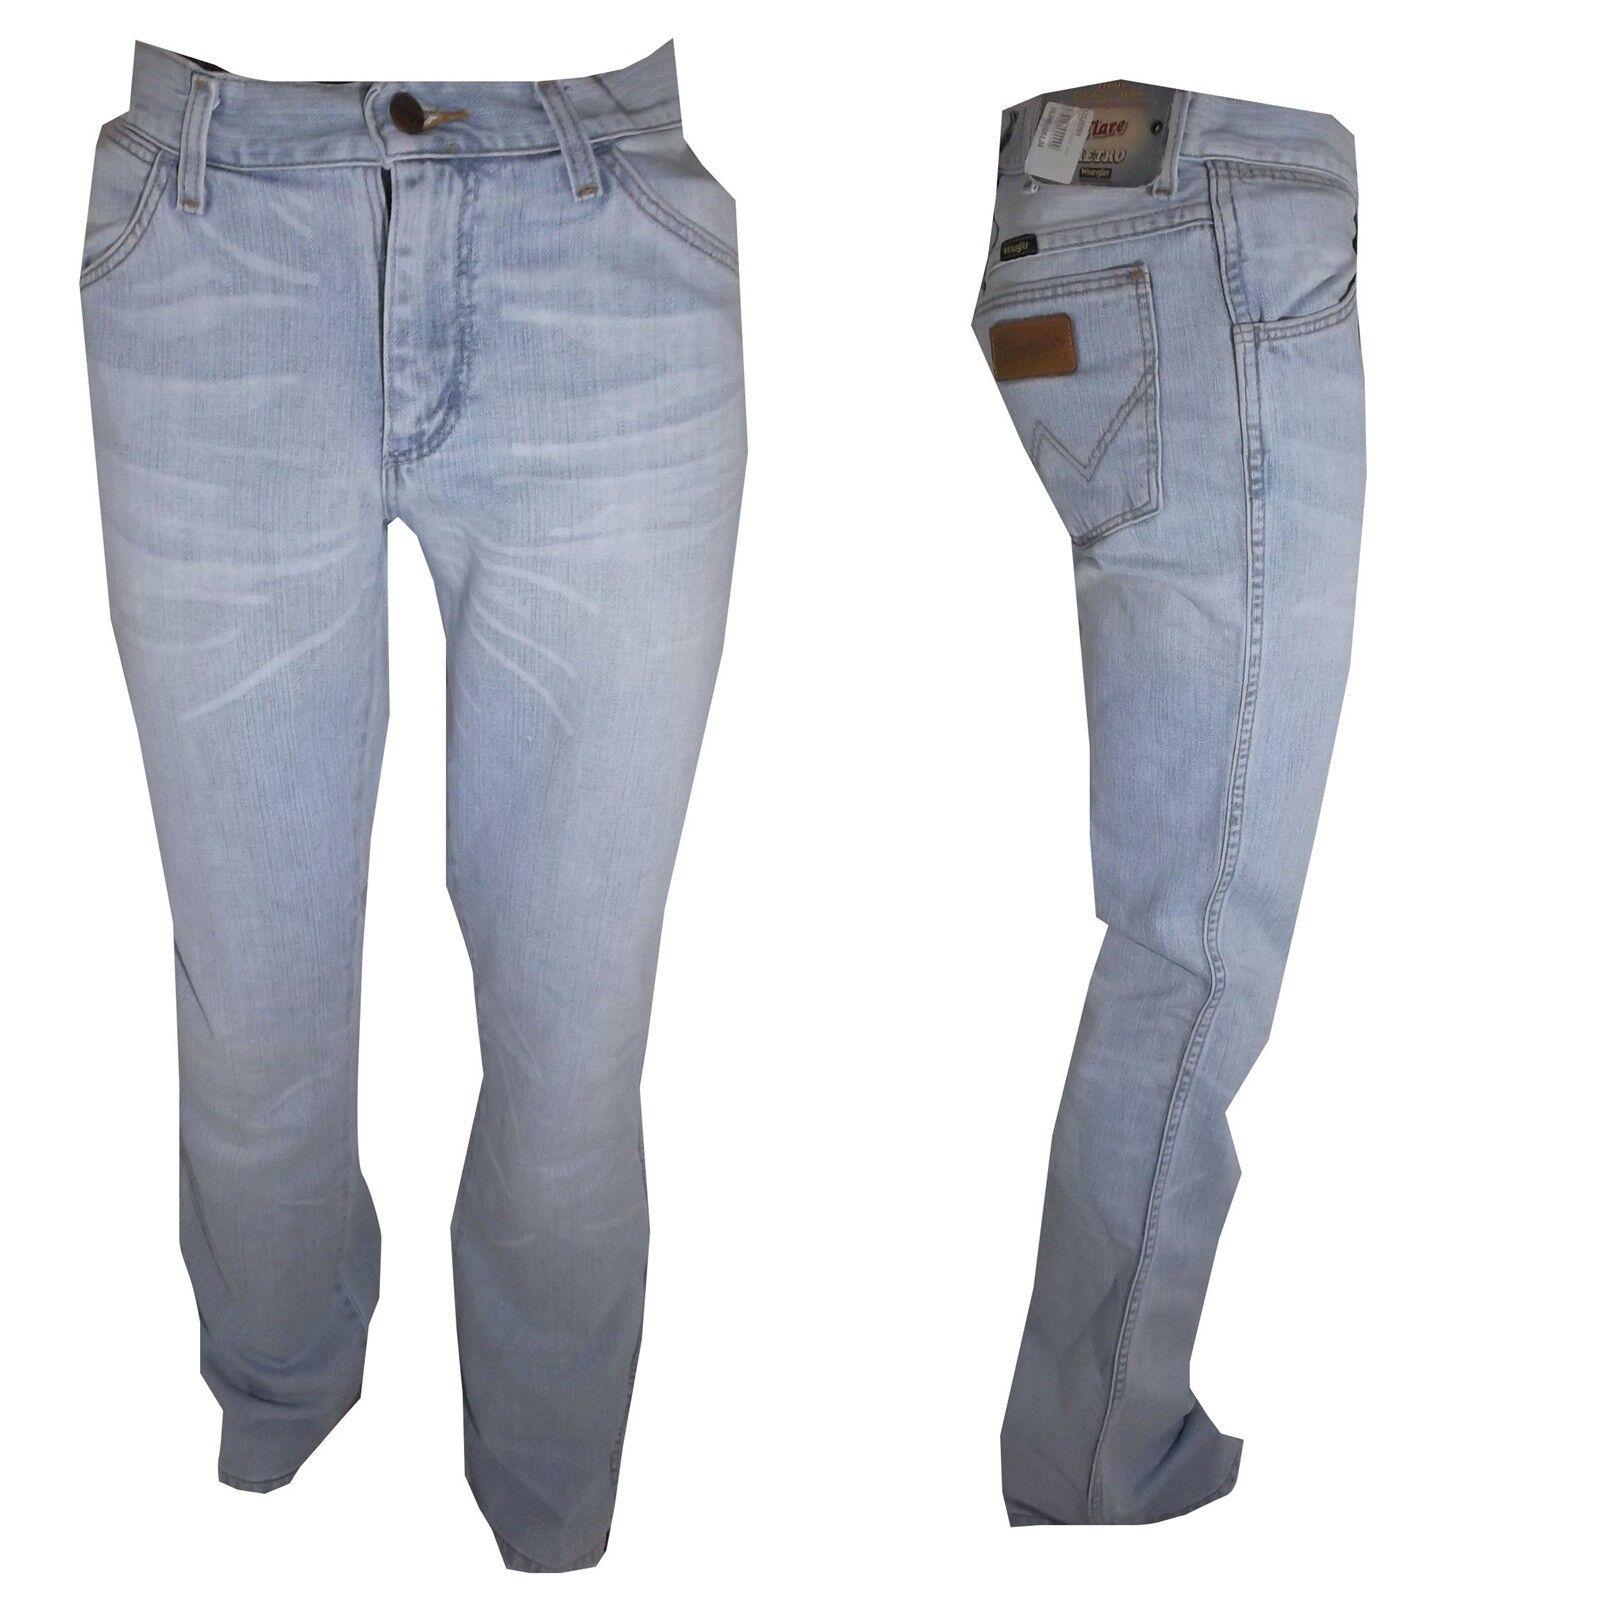 Jeans W28 Wrangler 29 Zampa Denim 30 Celeste Elefante b7yfg6